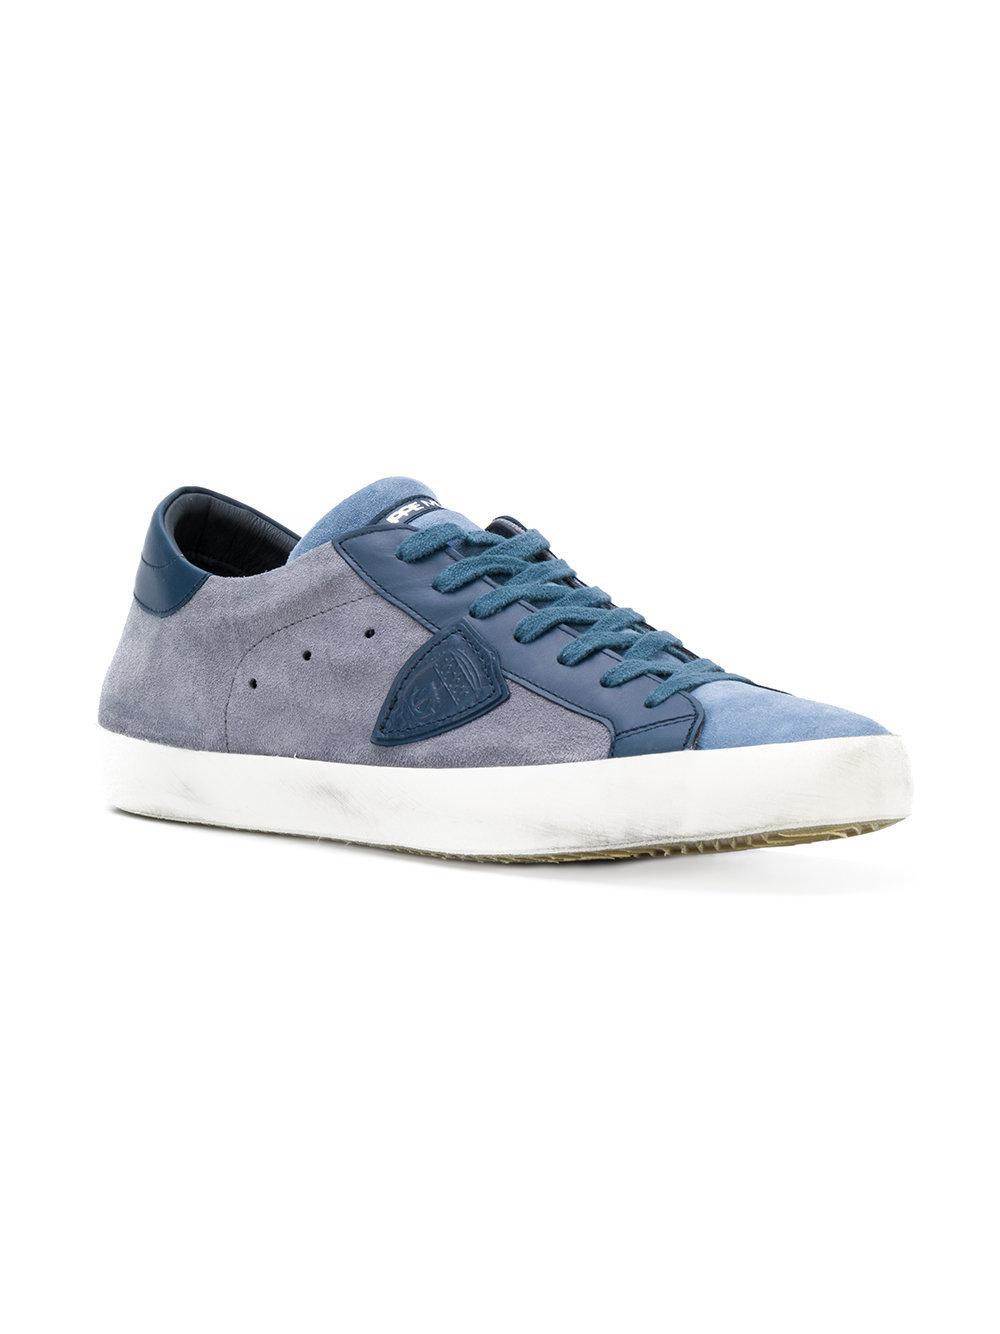 ... Sneakers basse in pelle scamosciata blu di Philippe Model ... 4bfe8ee4065